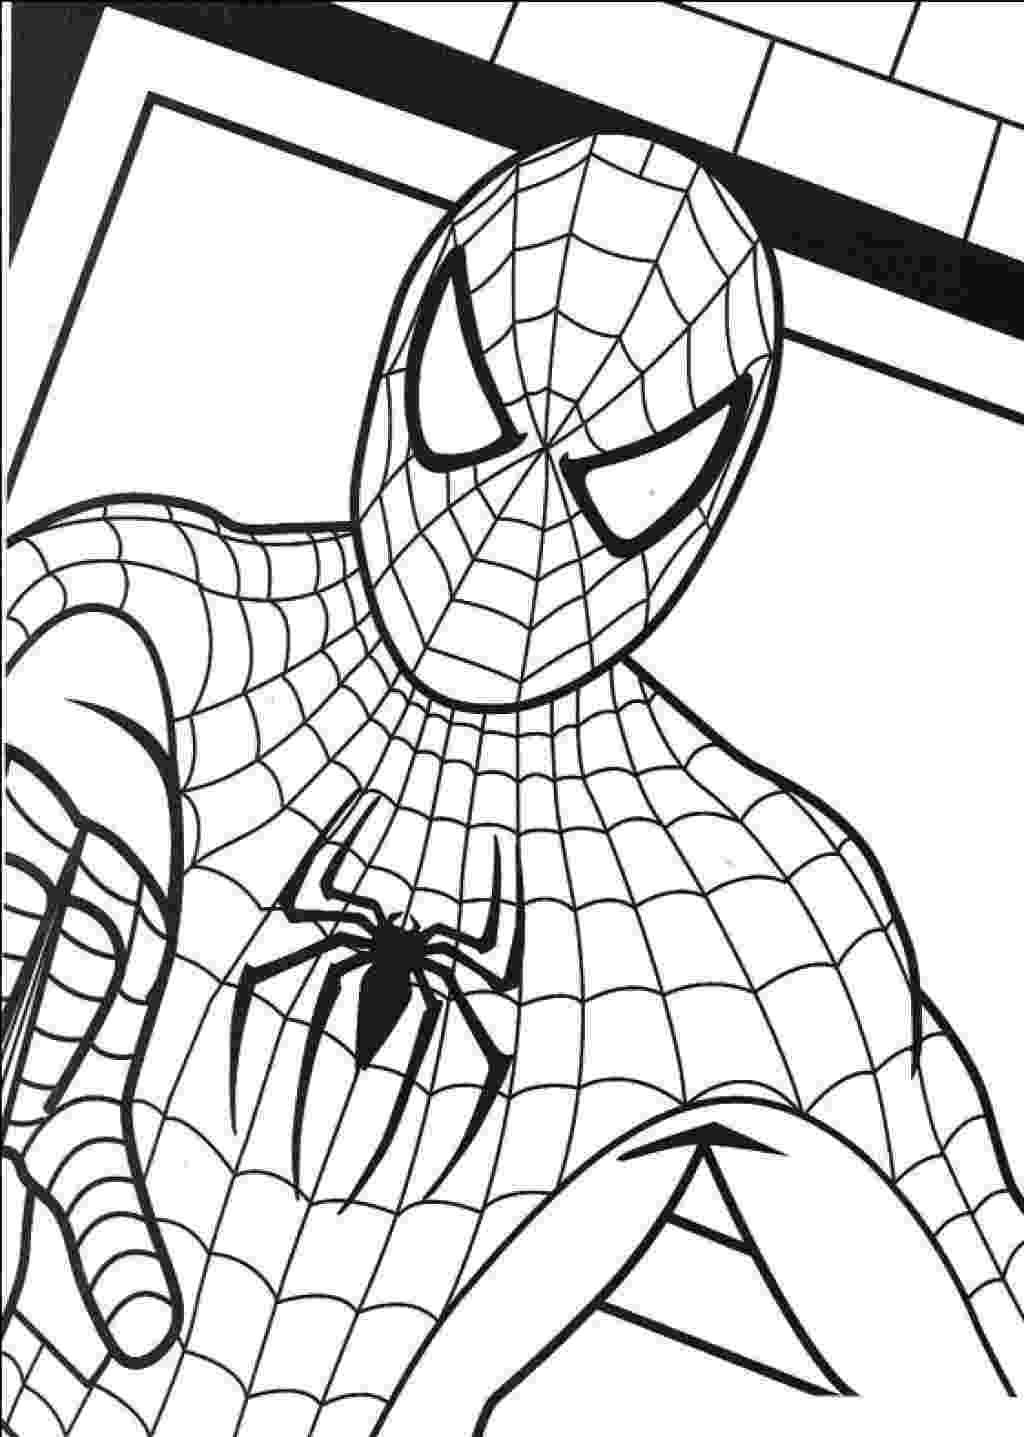 printable spiderman printable spiderman coloring pages for kids cool2bkids spiderman printable